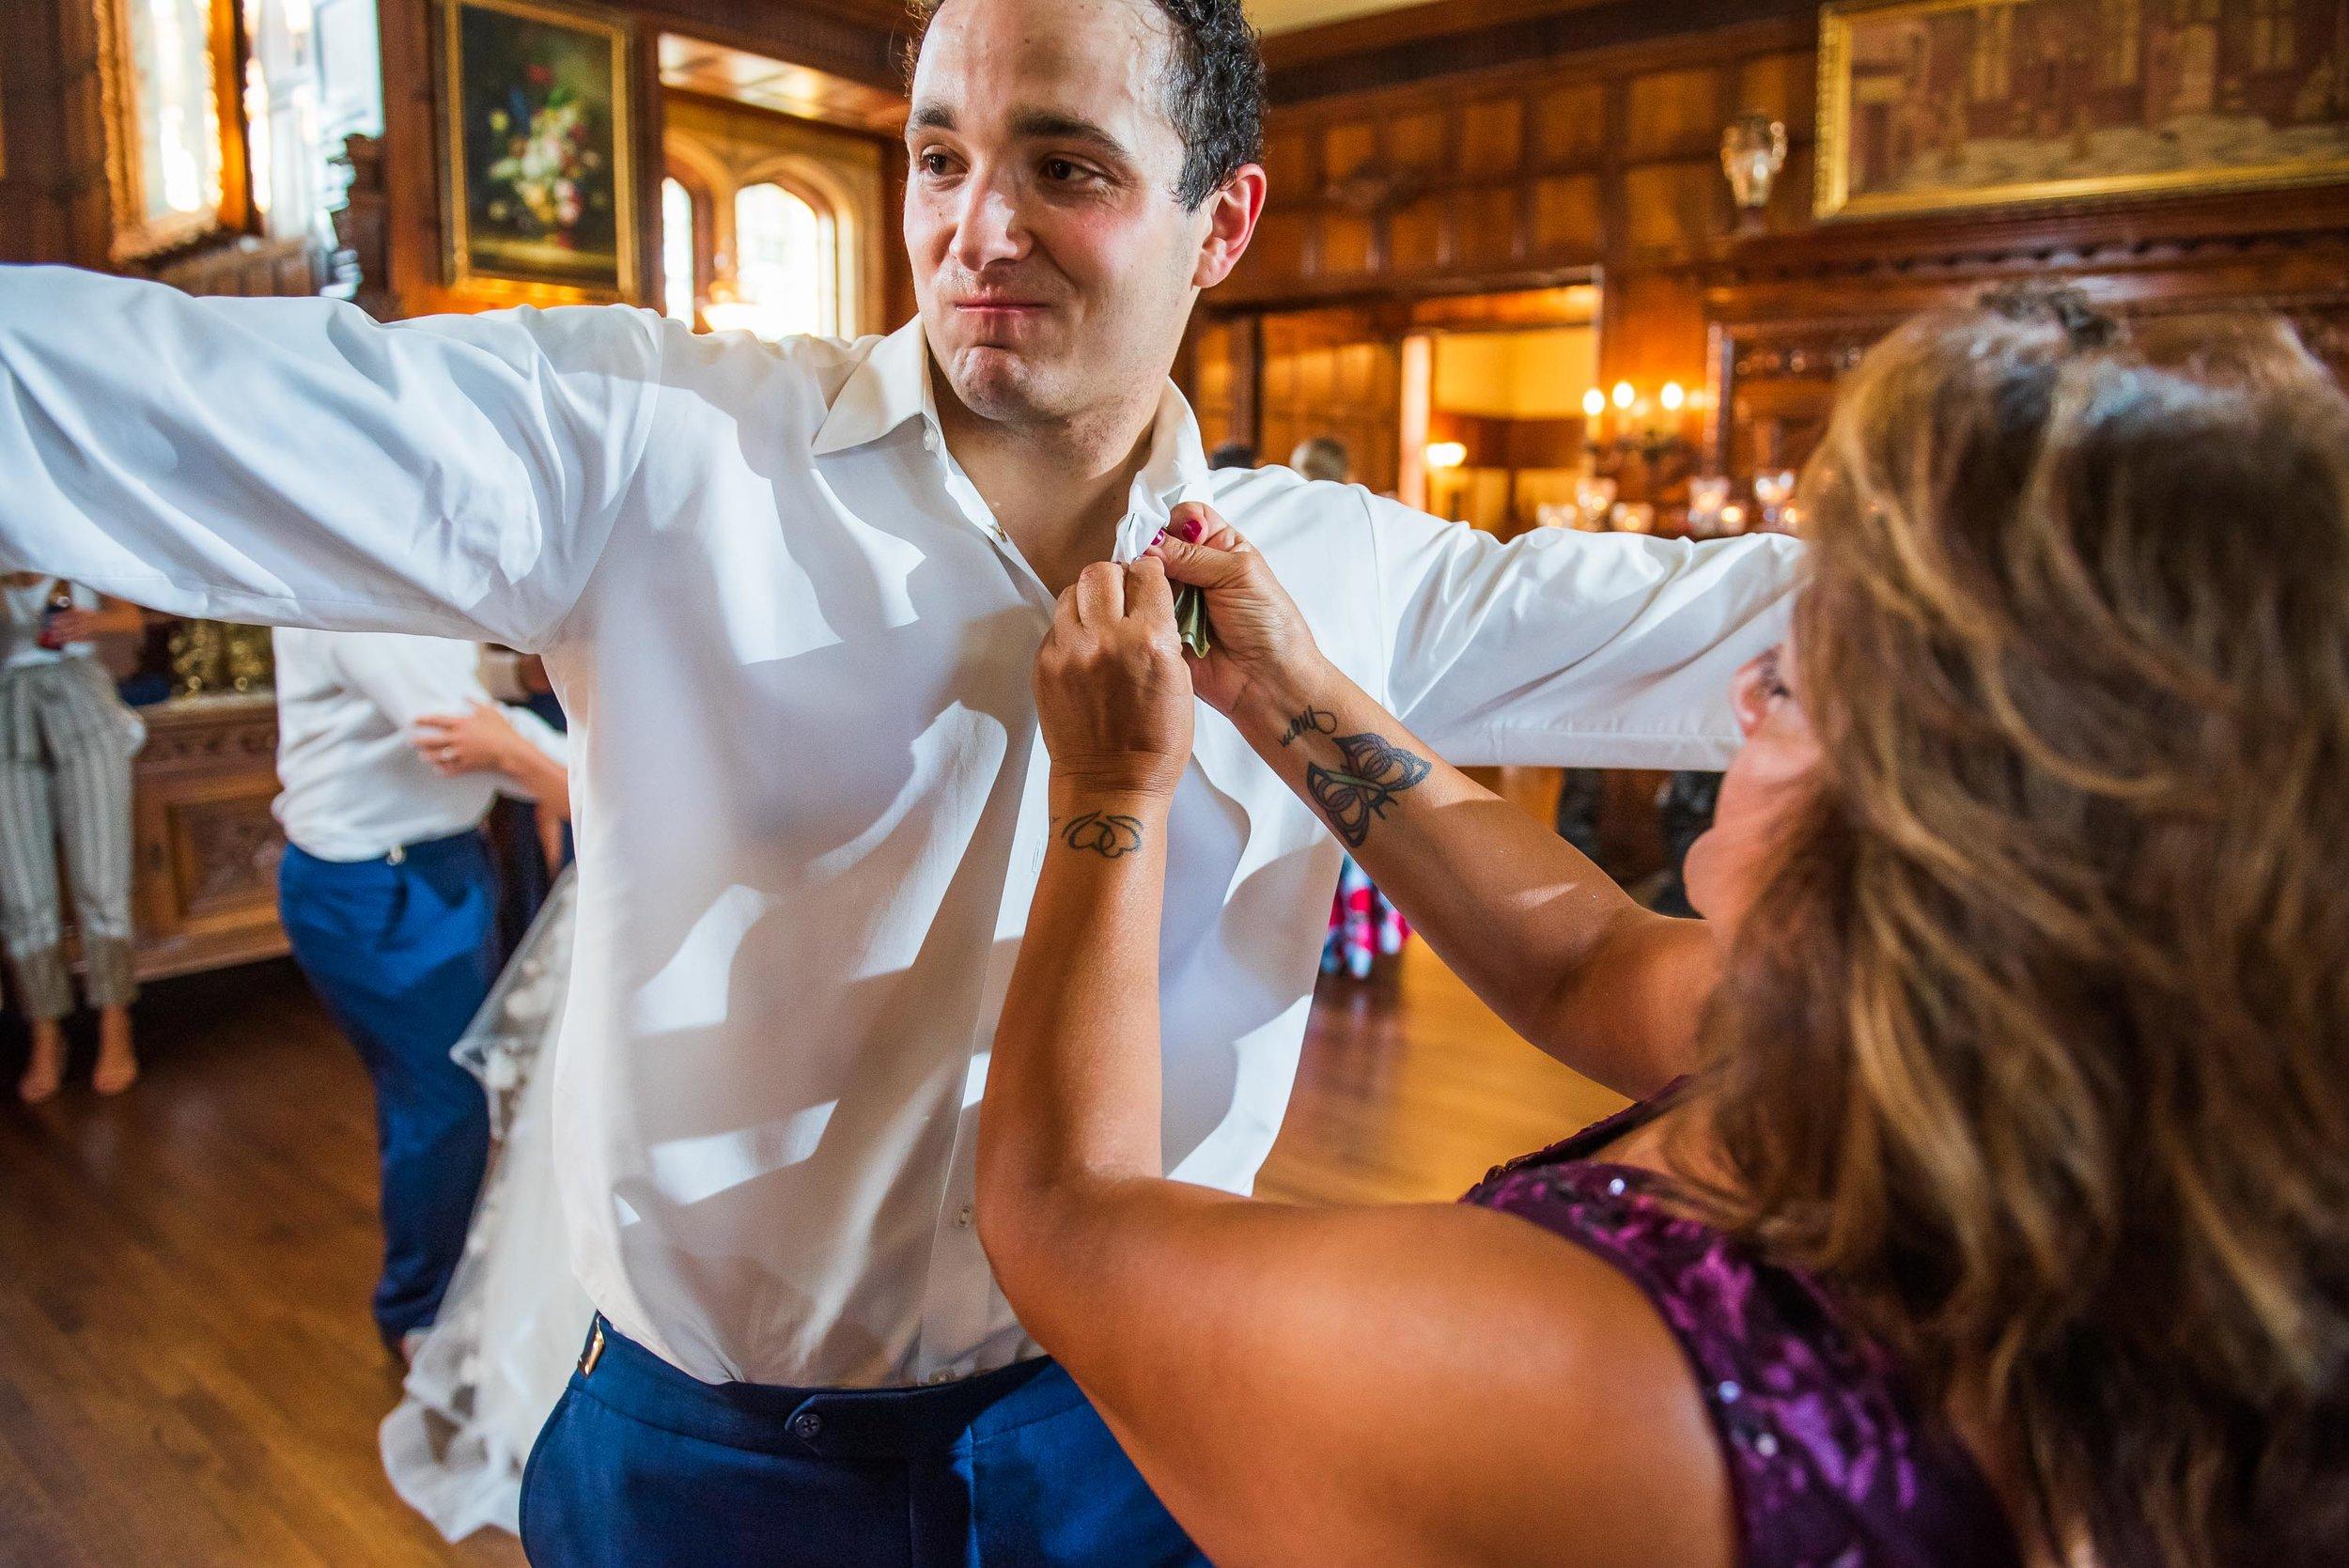 thornewood castle wedding 78.jpg